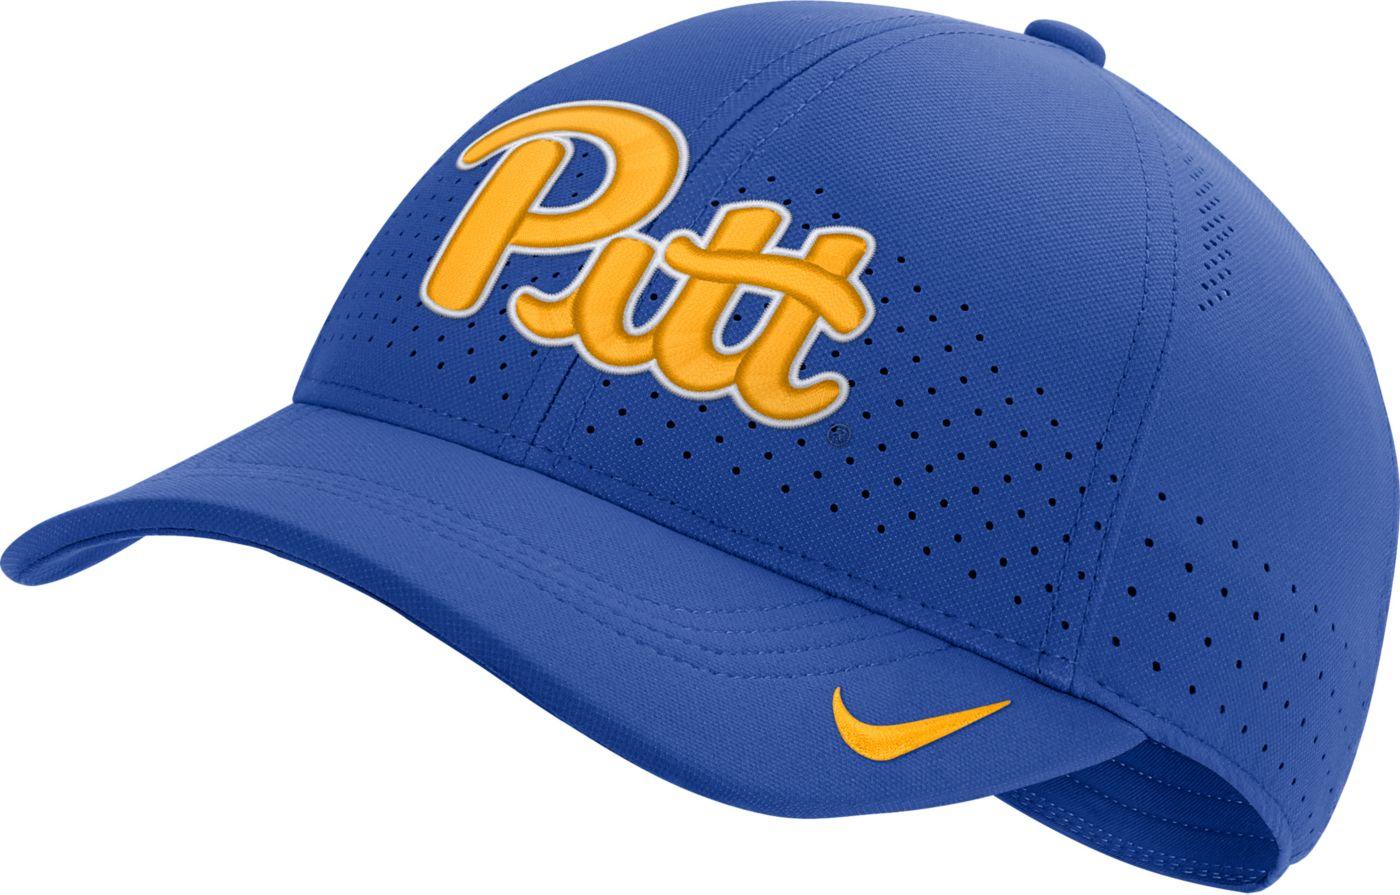 Nike Men's Pitt Panthers Blue Aerobill Classic99 Football Sideline Hat